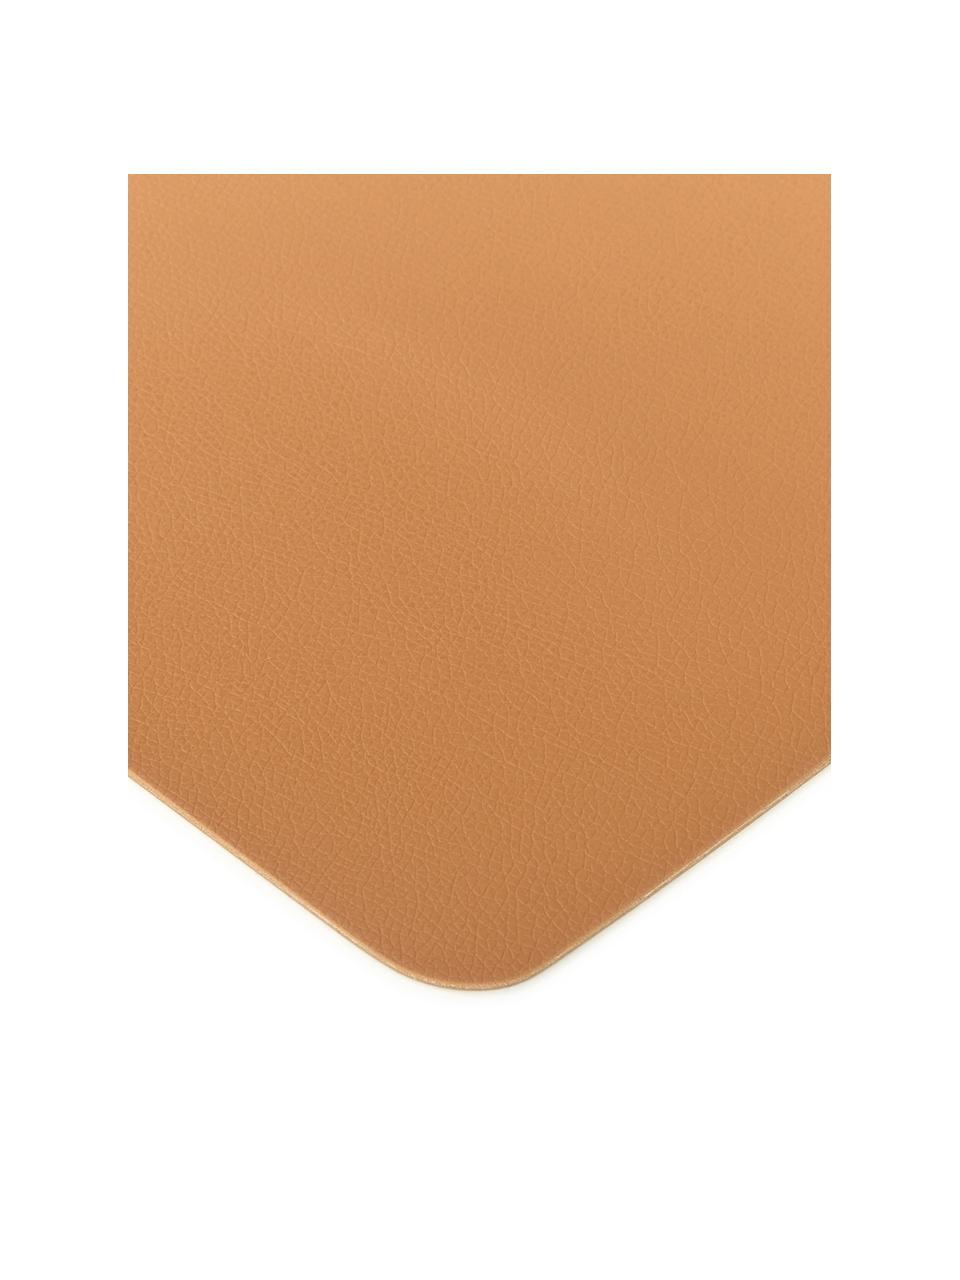 Tovaglietta americana in similpelle Pik 2 pz, Similpelle (PVC), Caramello, Larg. 33 x Lung. 46 cm